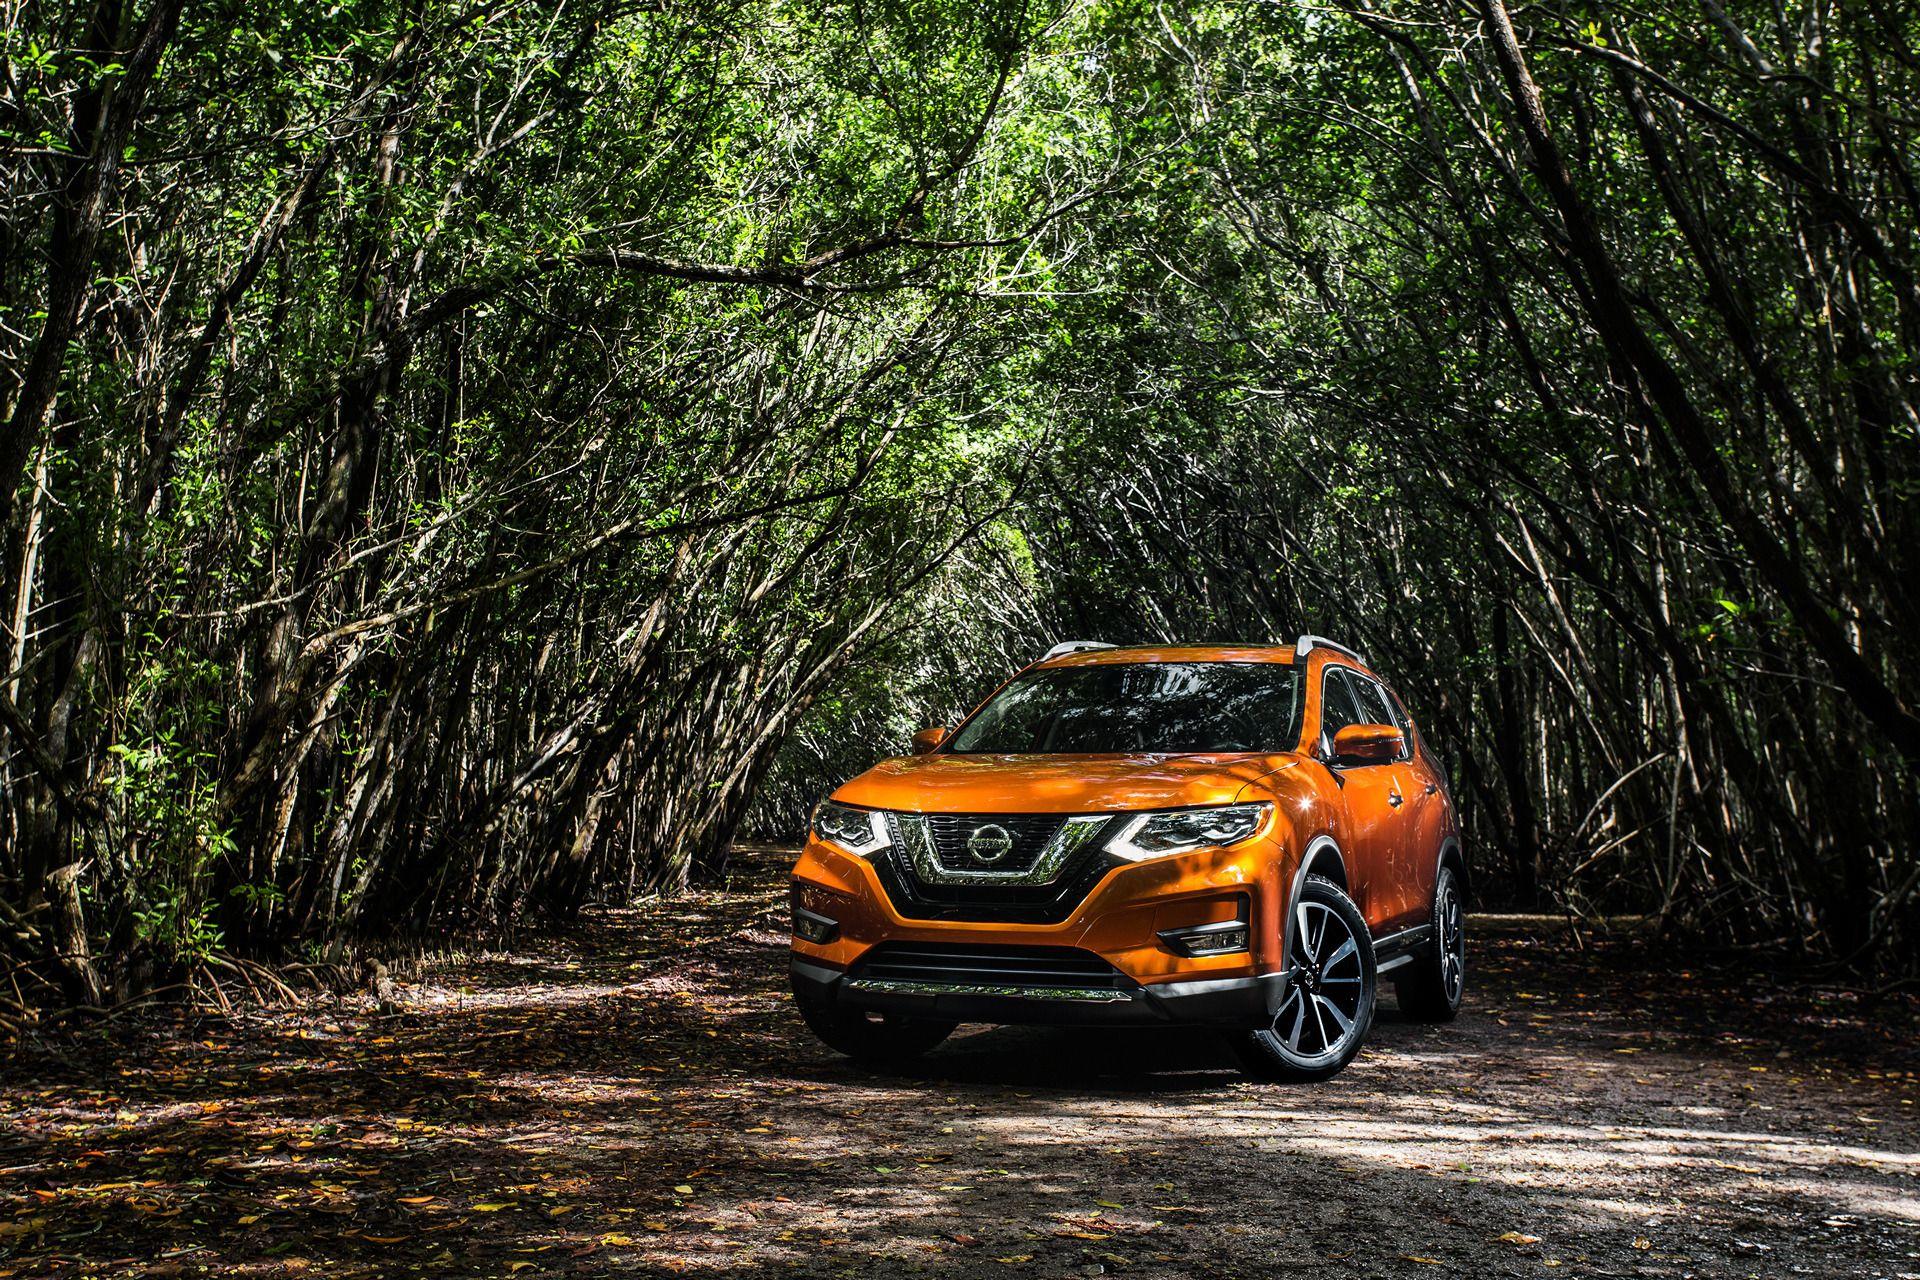 2017 Nissan Rogue Review Nissan rogue, Nissan, Rock auto